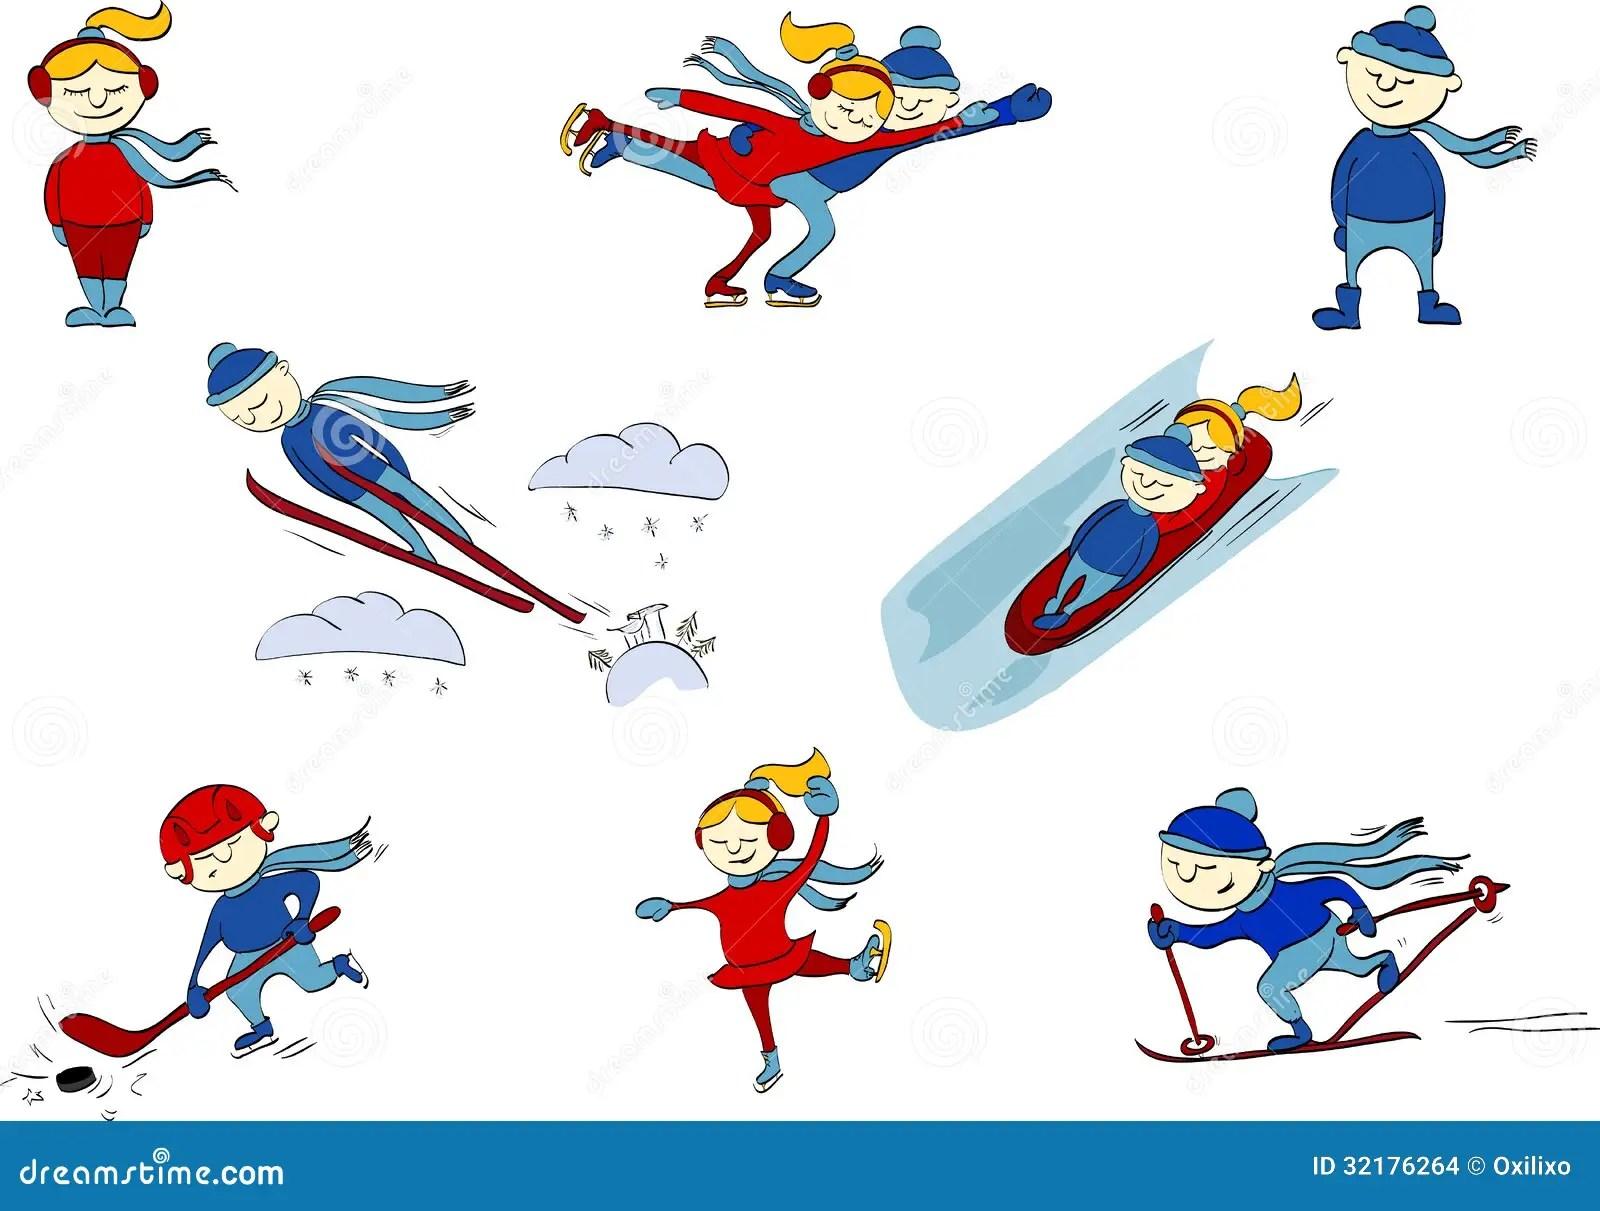 Worksheet Winter Sports